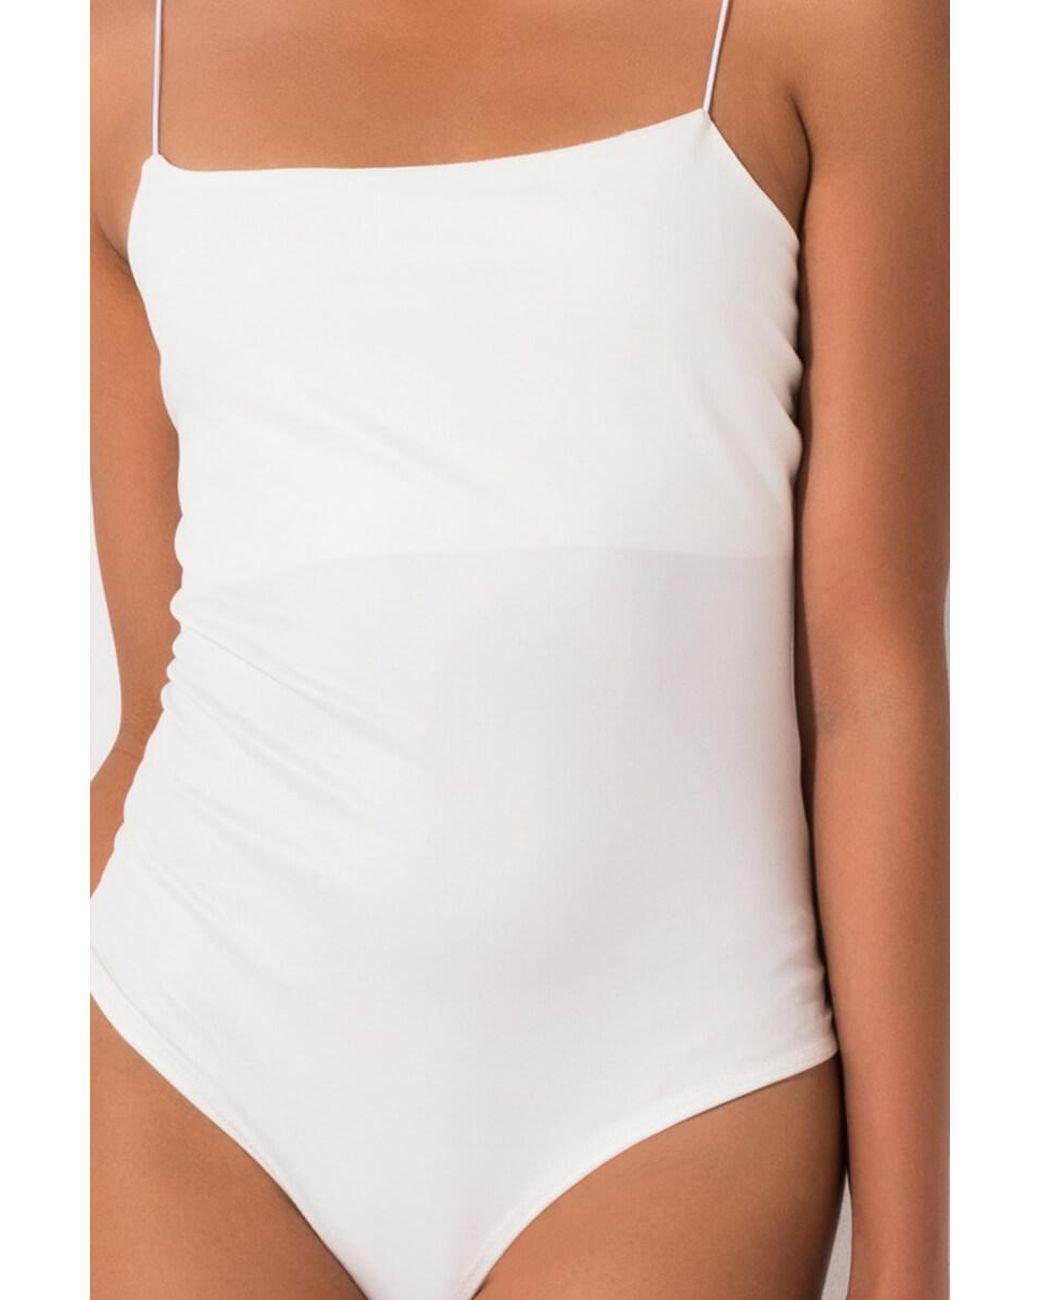 AKIRA Womens Wet Look Vinyl Pleather Latex Scoop Neck Thong Bodysuit Leotard